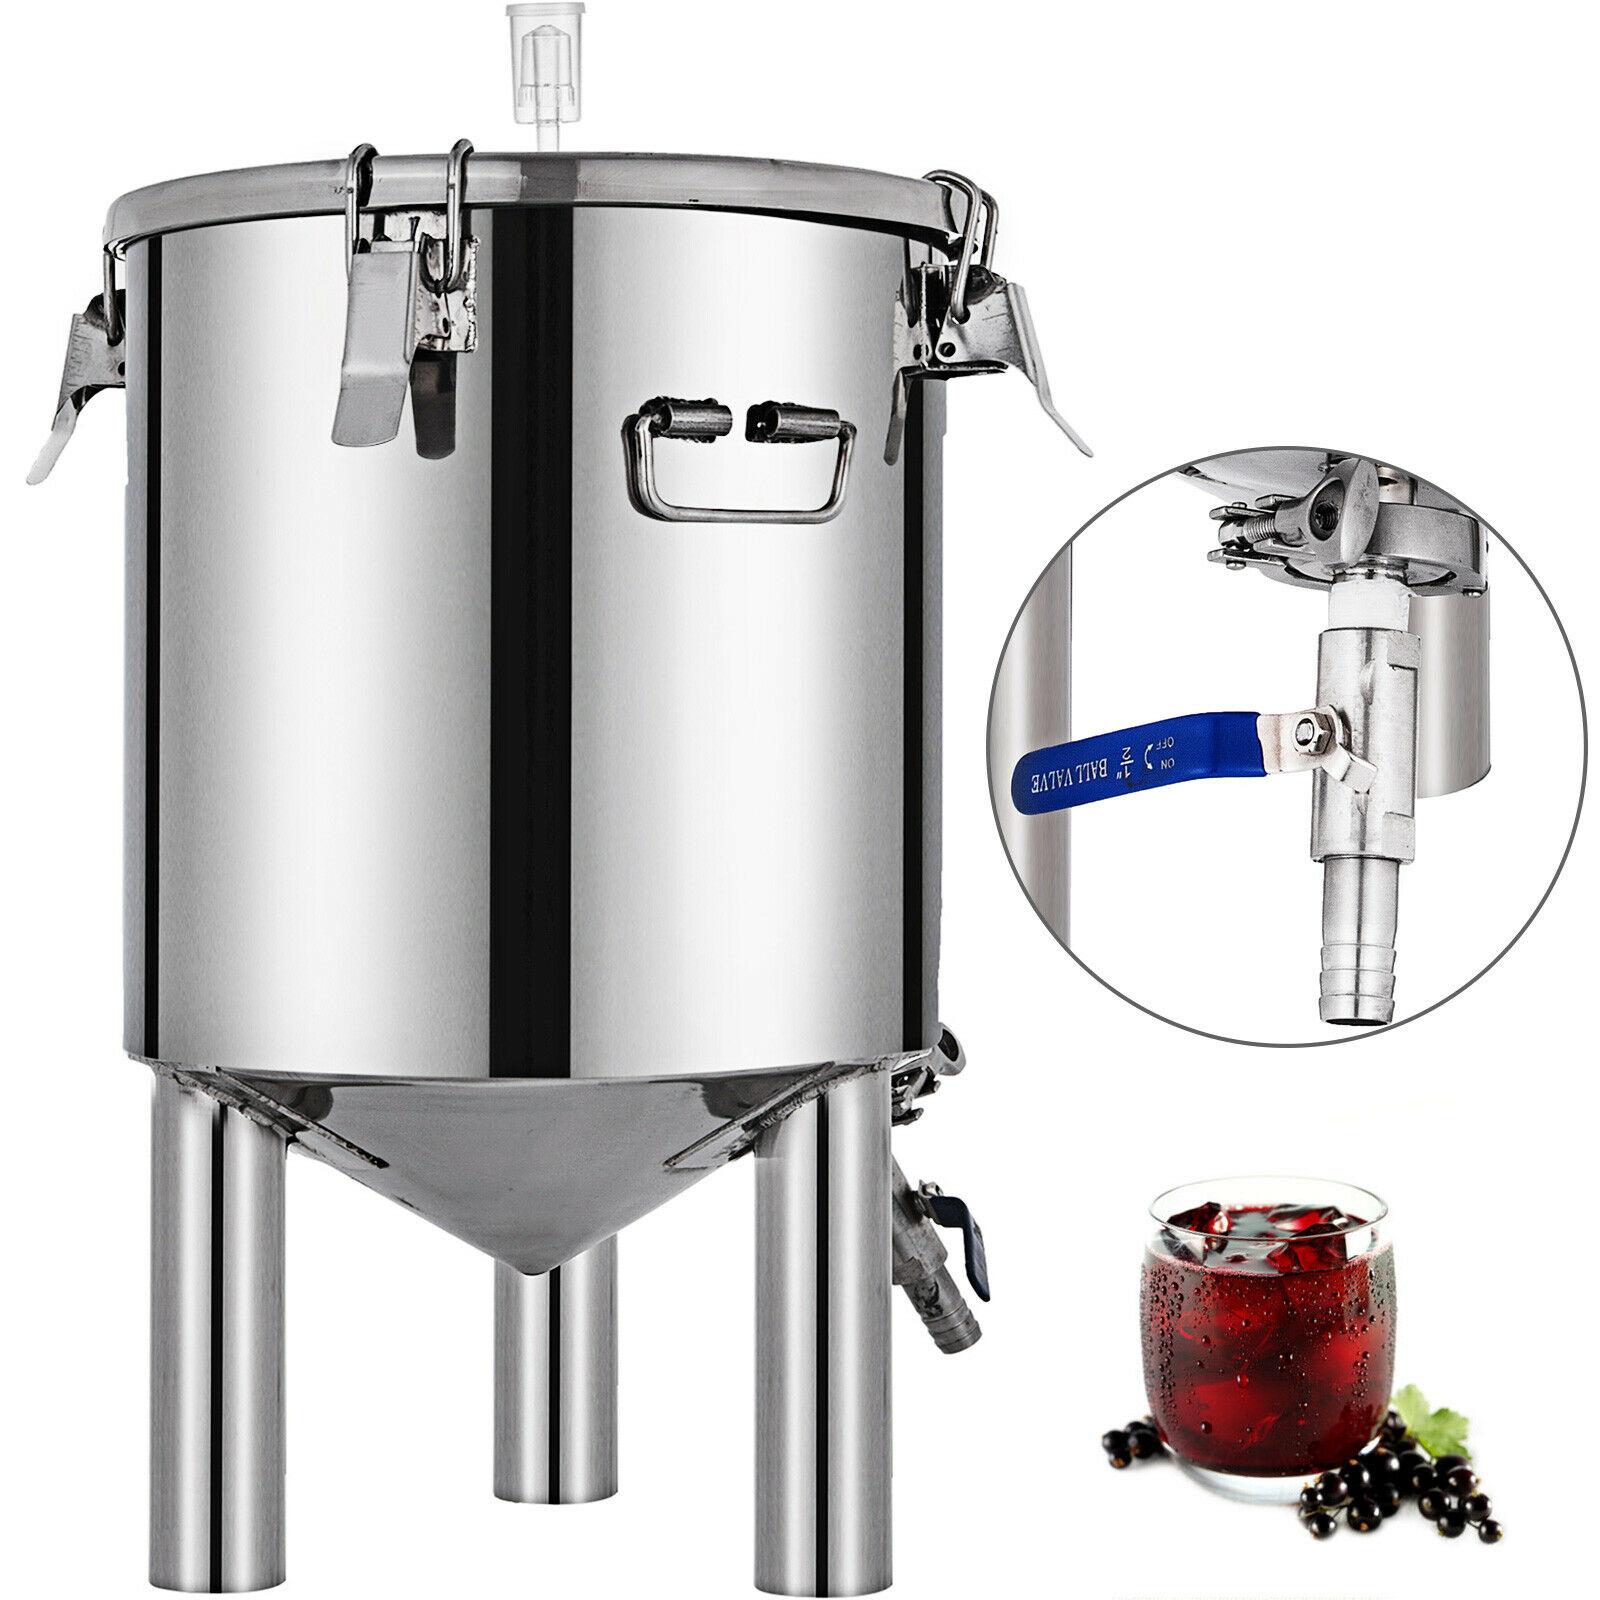 VEVOR 15L 26L 50L الكحول موزع الجعة صناعة الأغذية محلية الصنع المقطر معدات التقطير النبيذ للمطبخ الخارجي